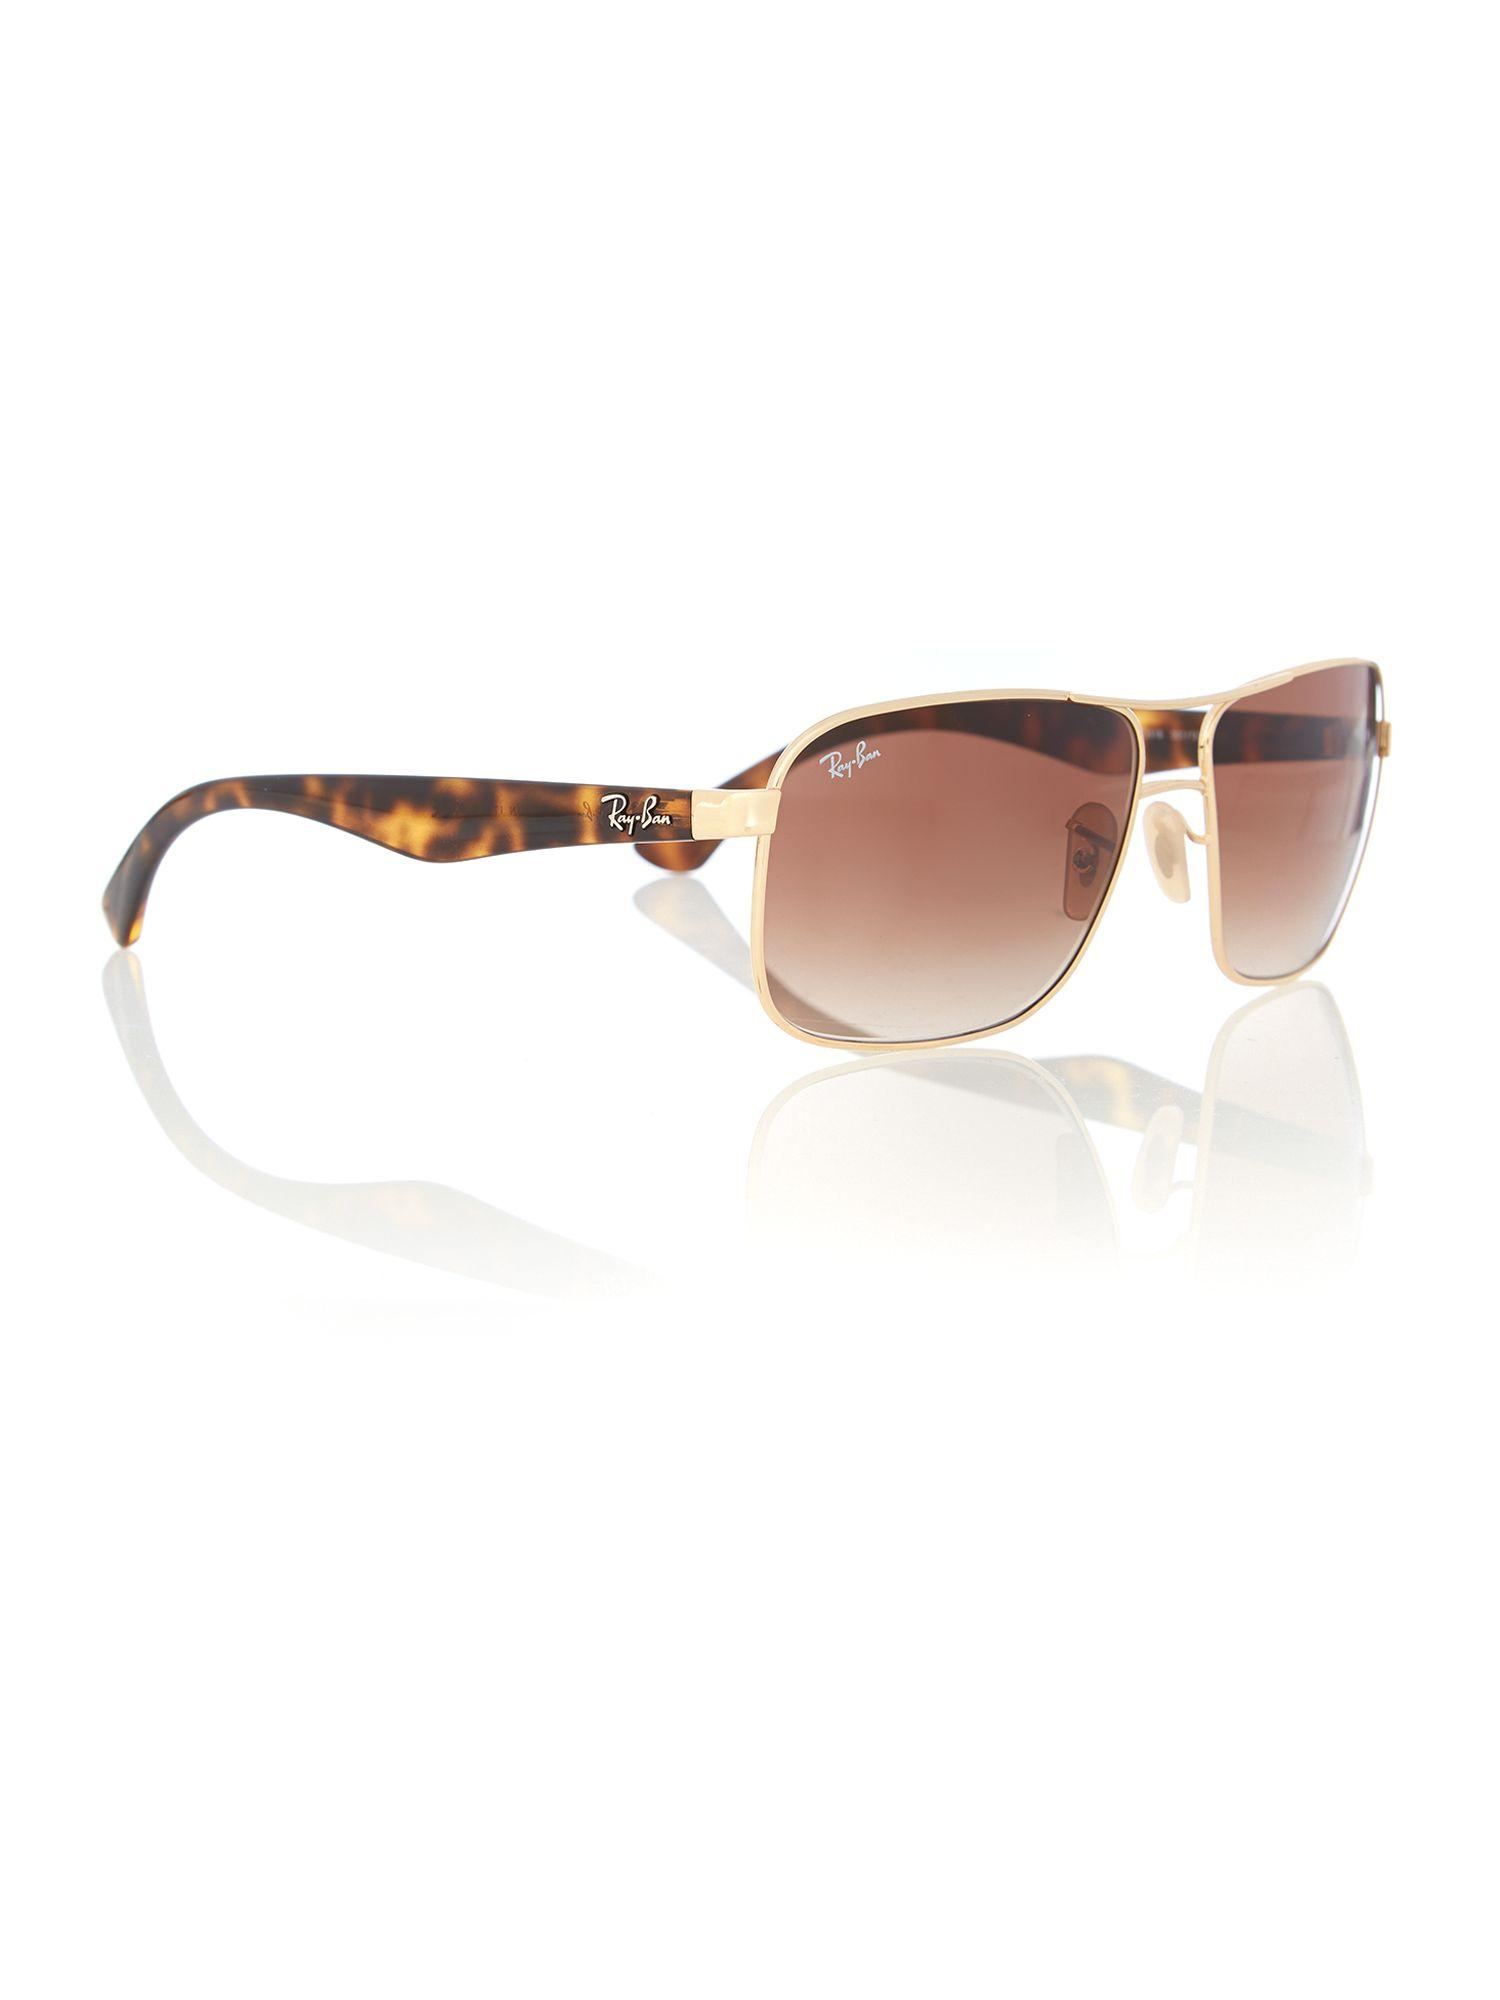 blues brothers ray ban wayfarer sunglasses 2014